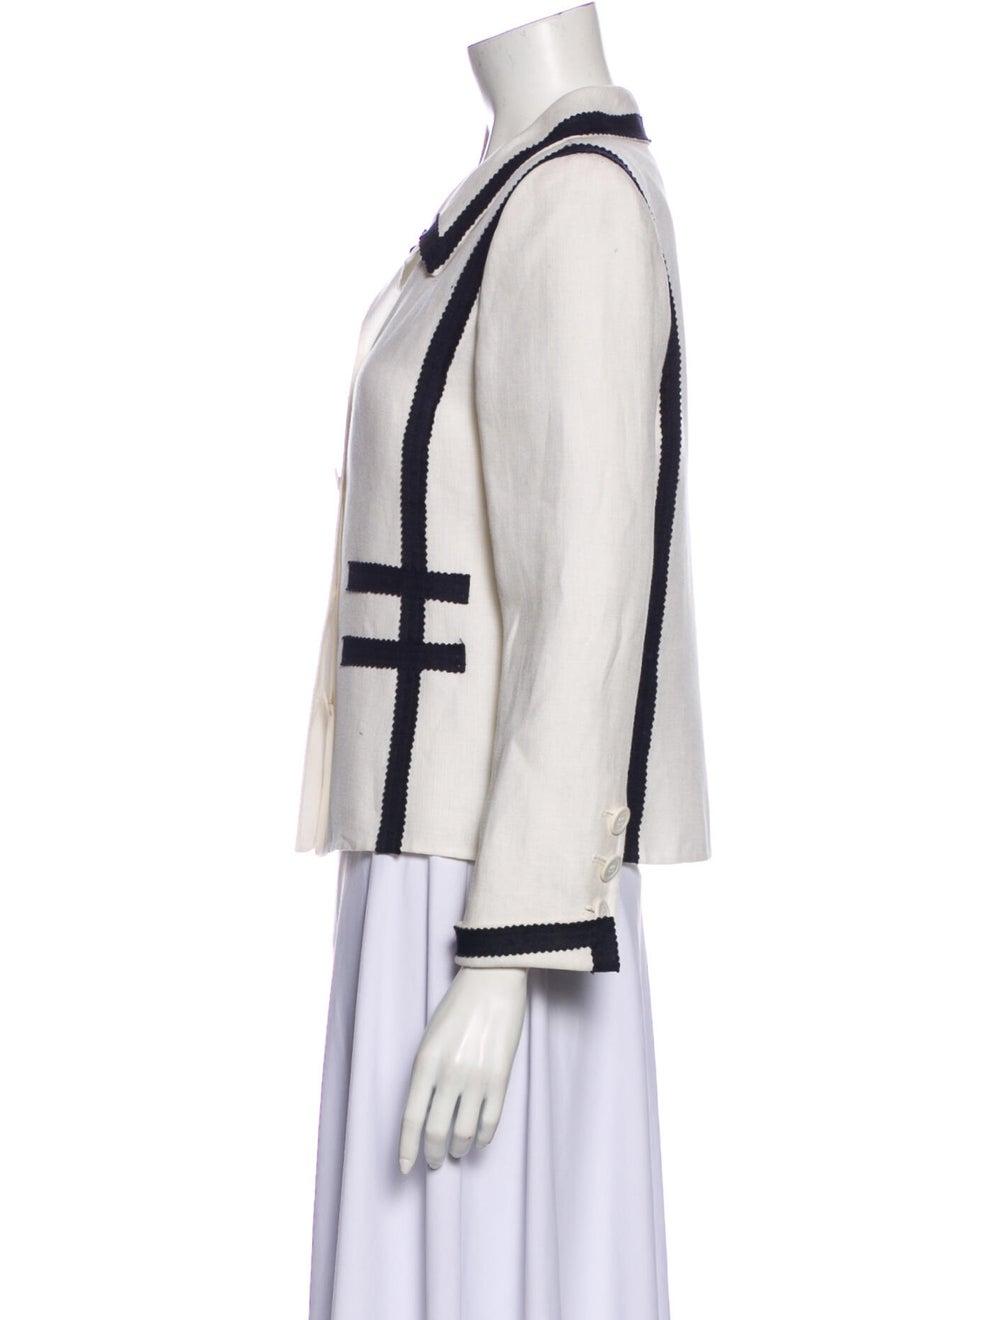 Oscar de la Renta Linen Jacket White - image 2